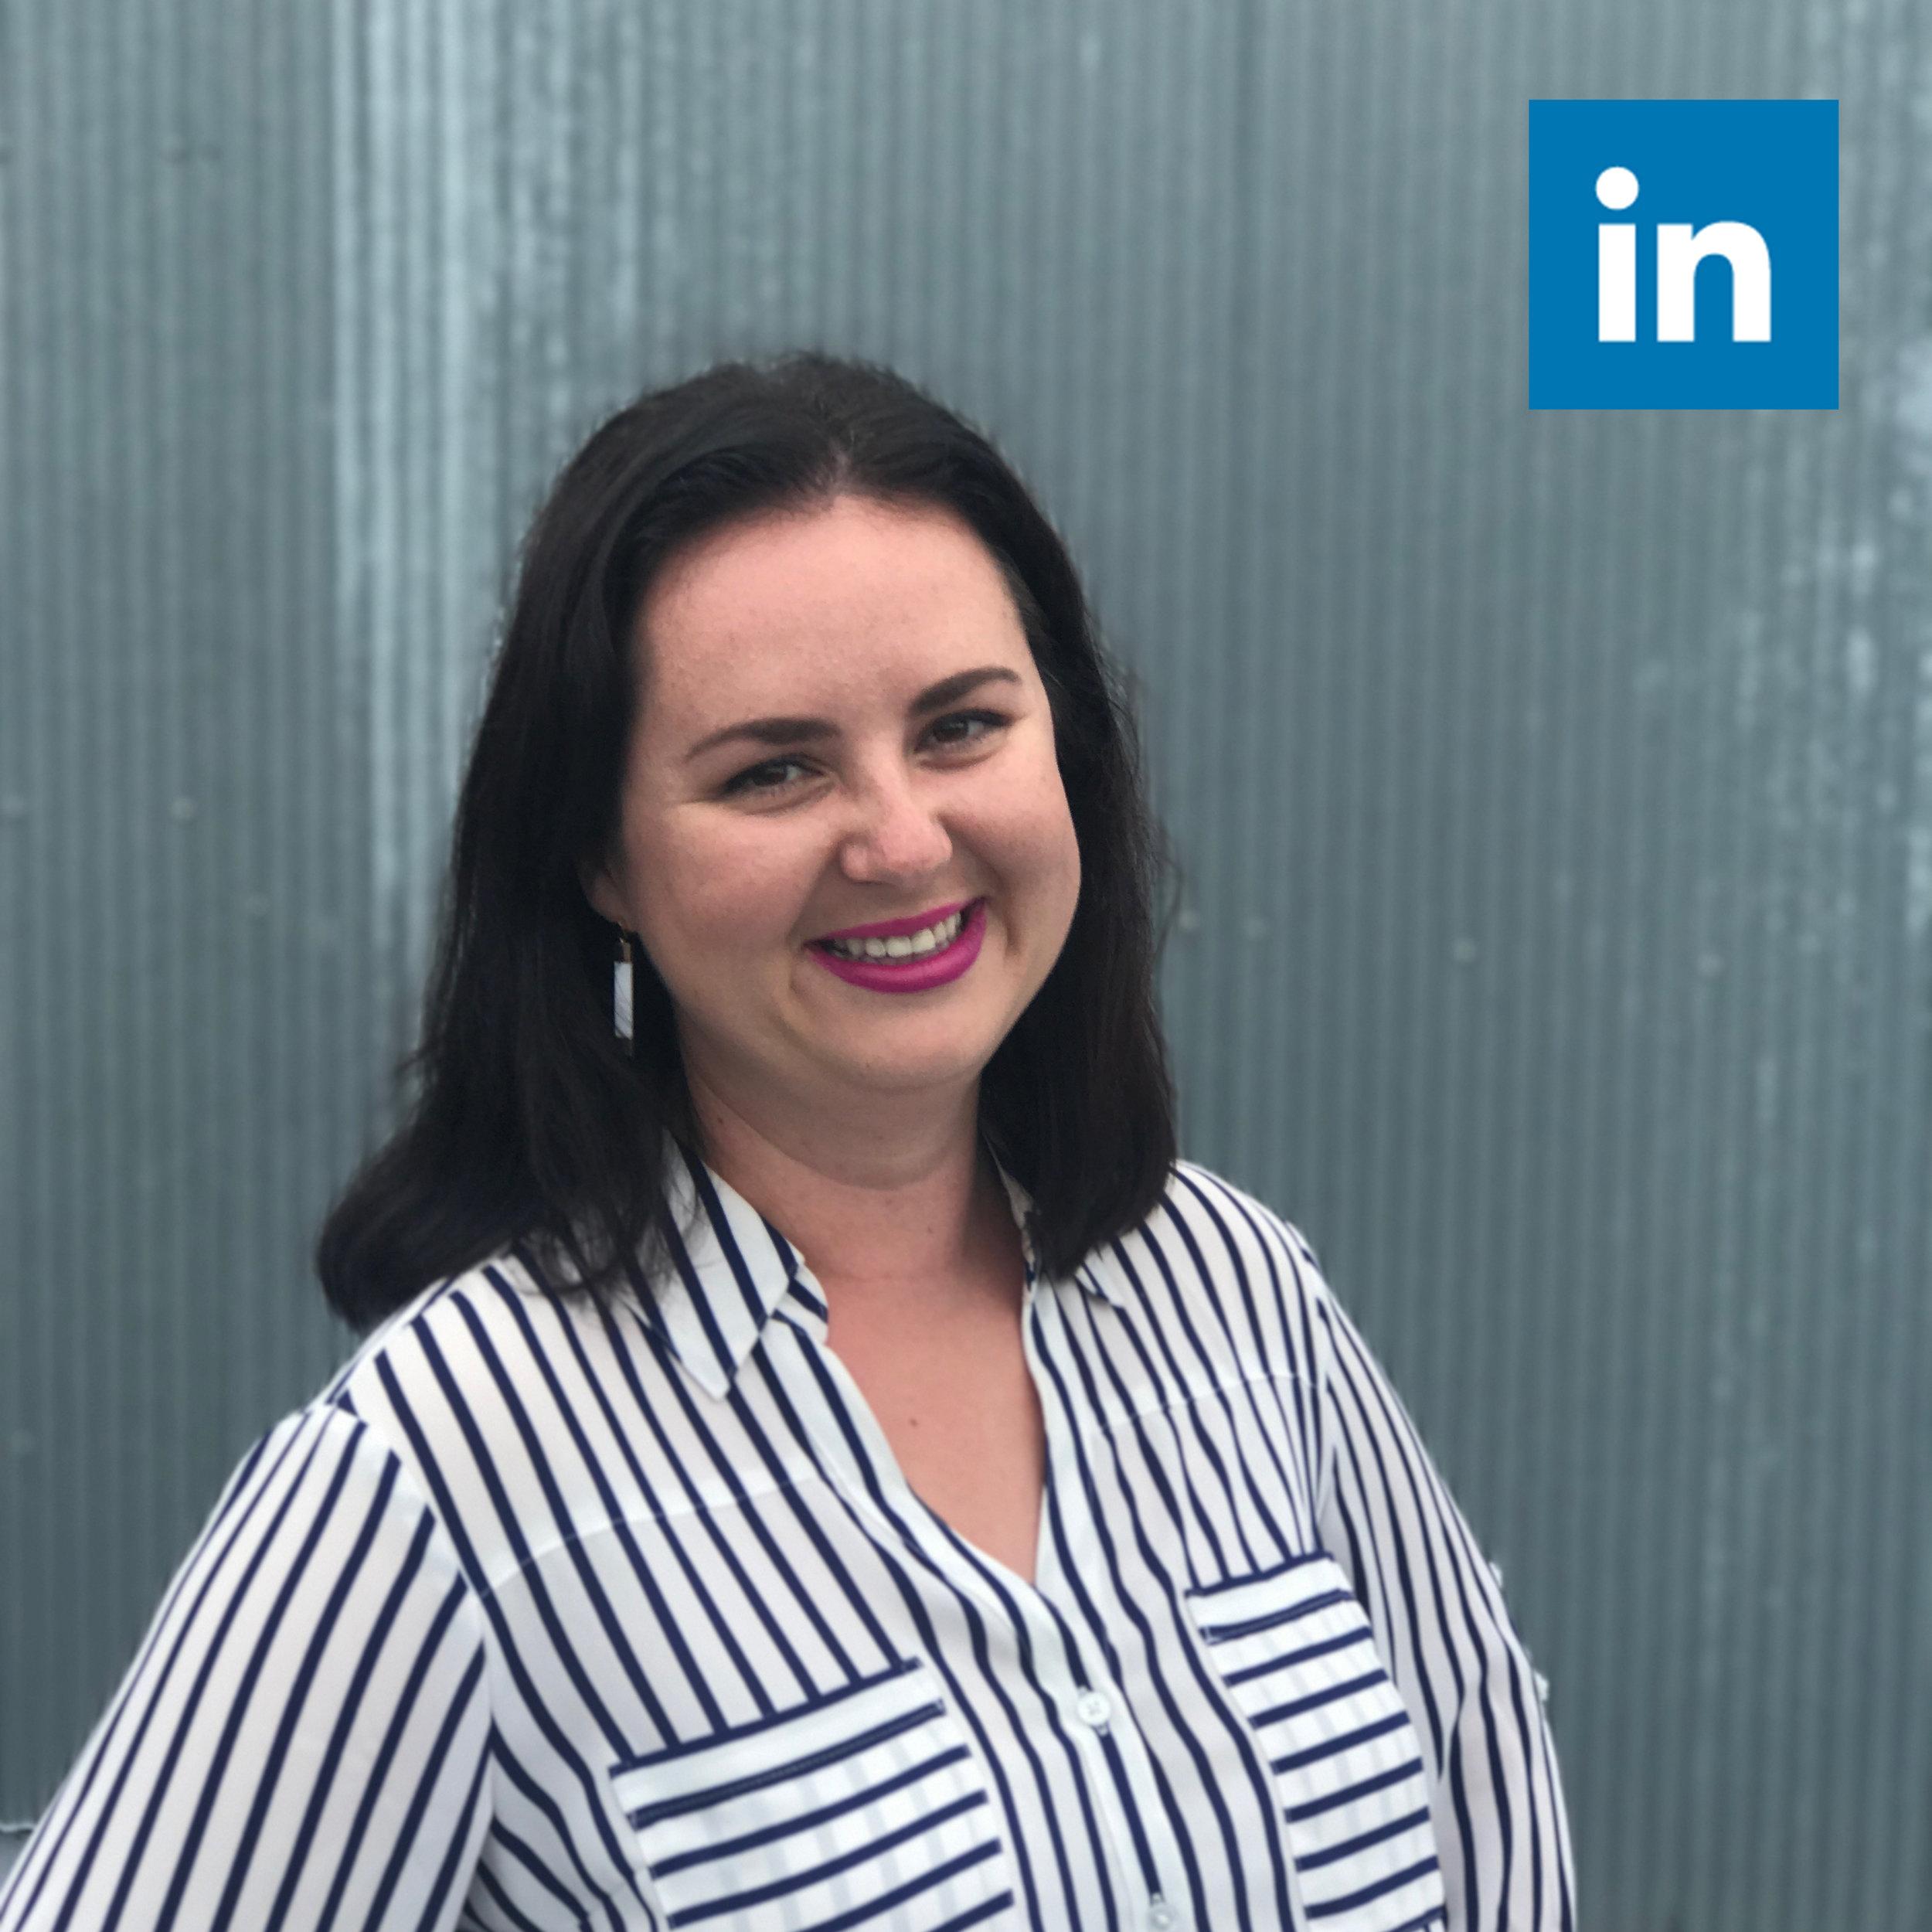 Anna | VP of UX & Mktg